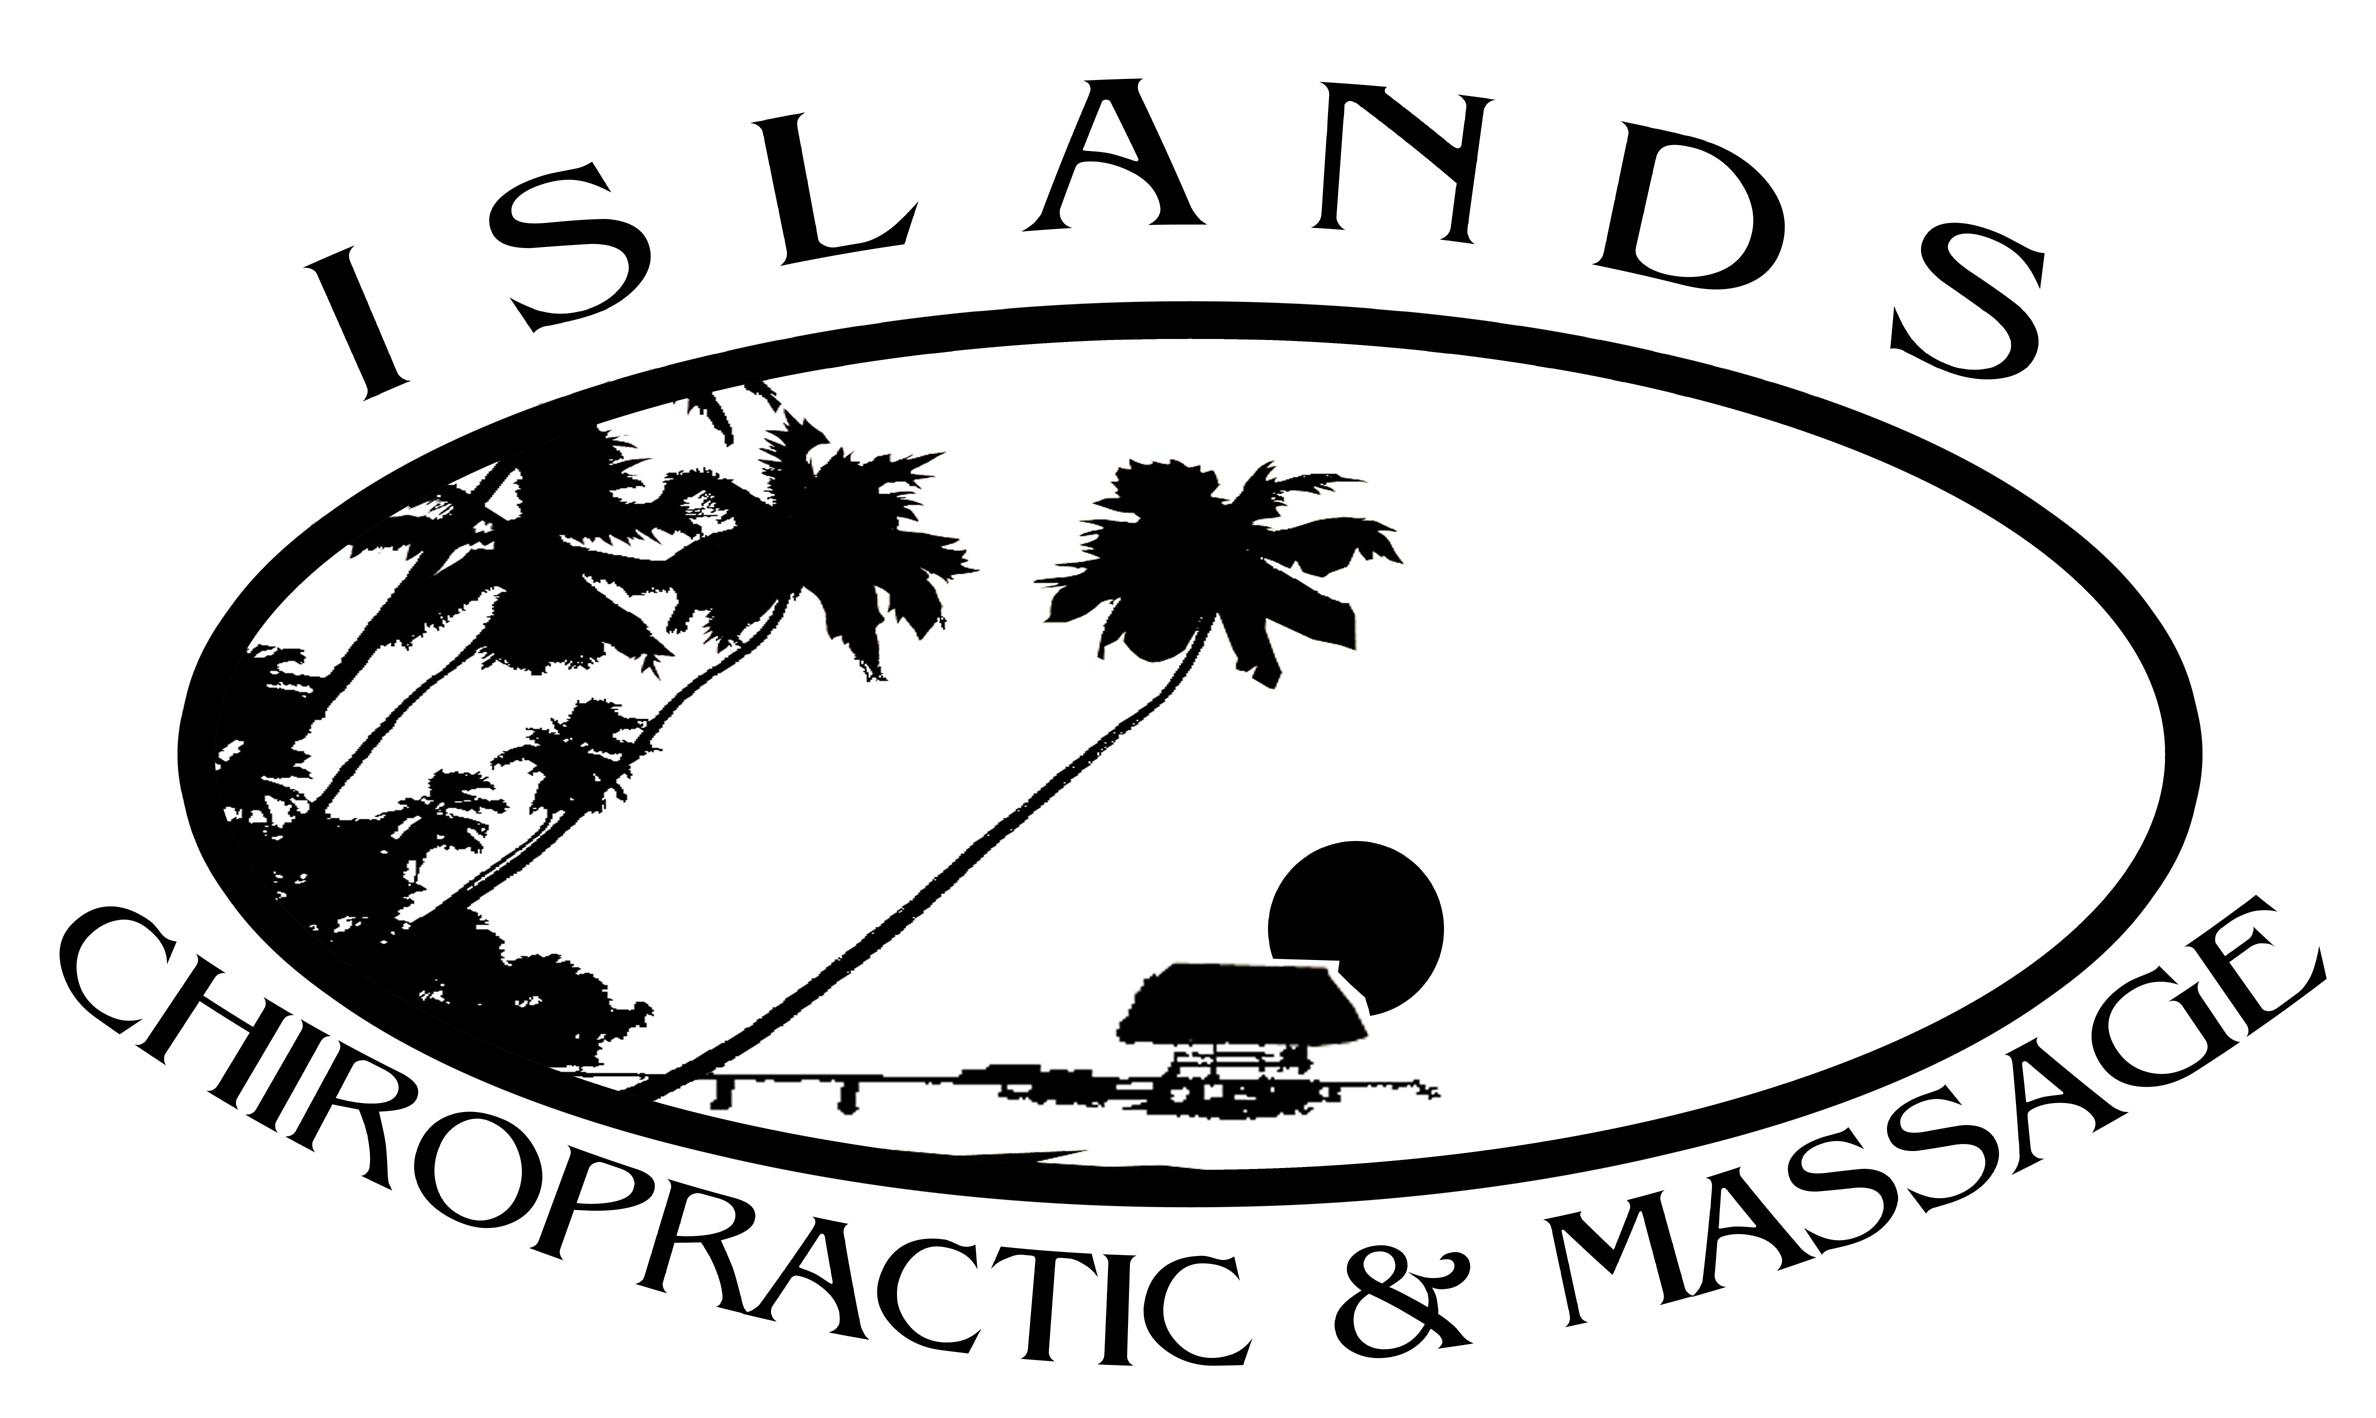 Islands Chiropractic & Massage